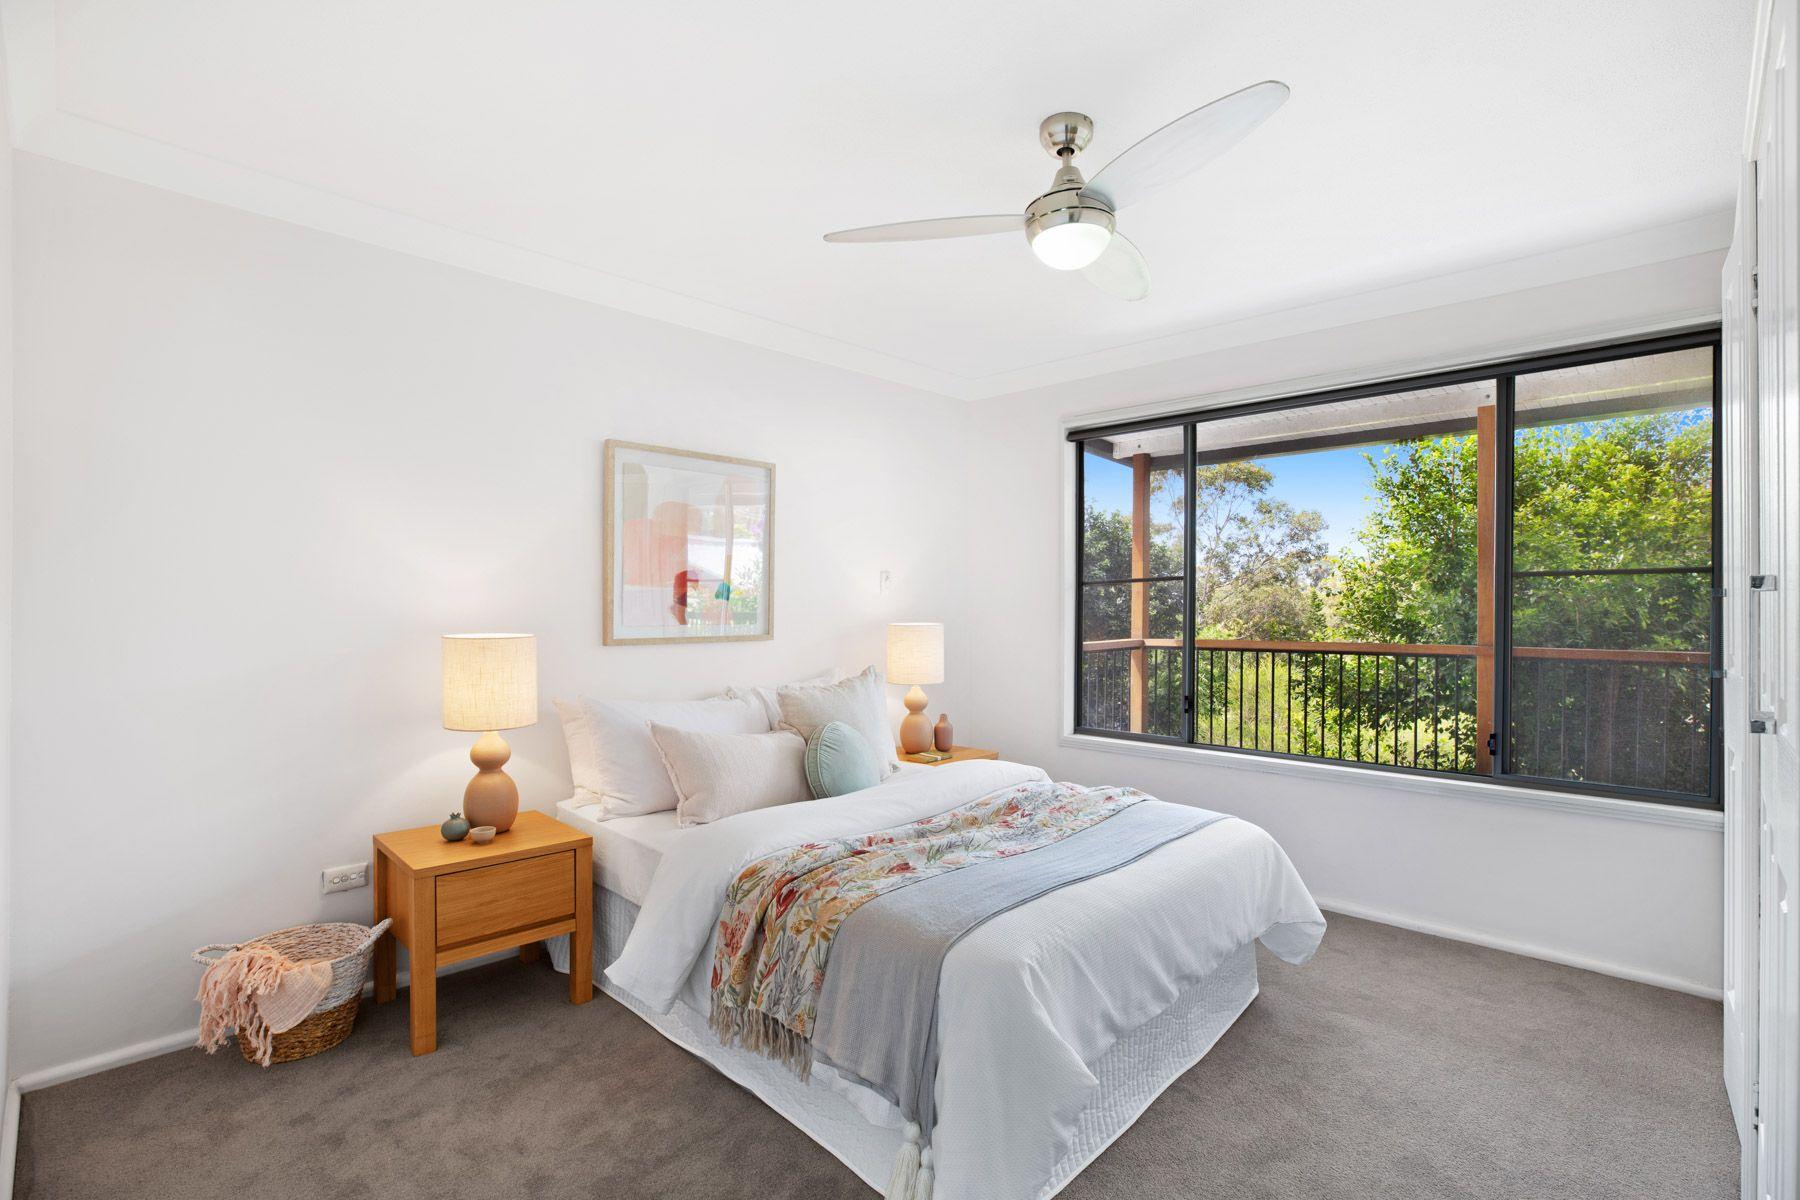 42 Nunda Road, Wangi Wangi, NSW 2267